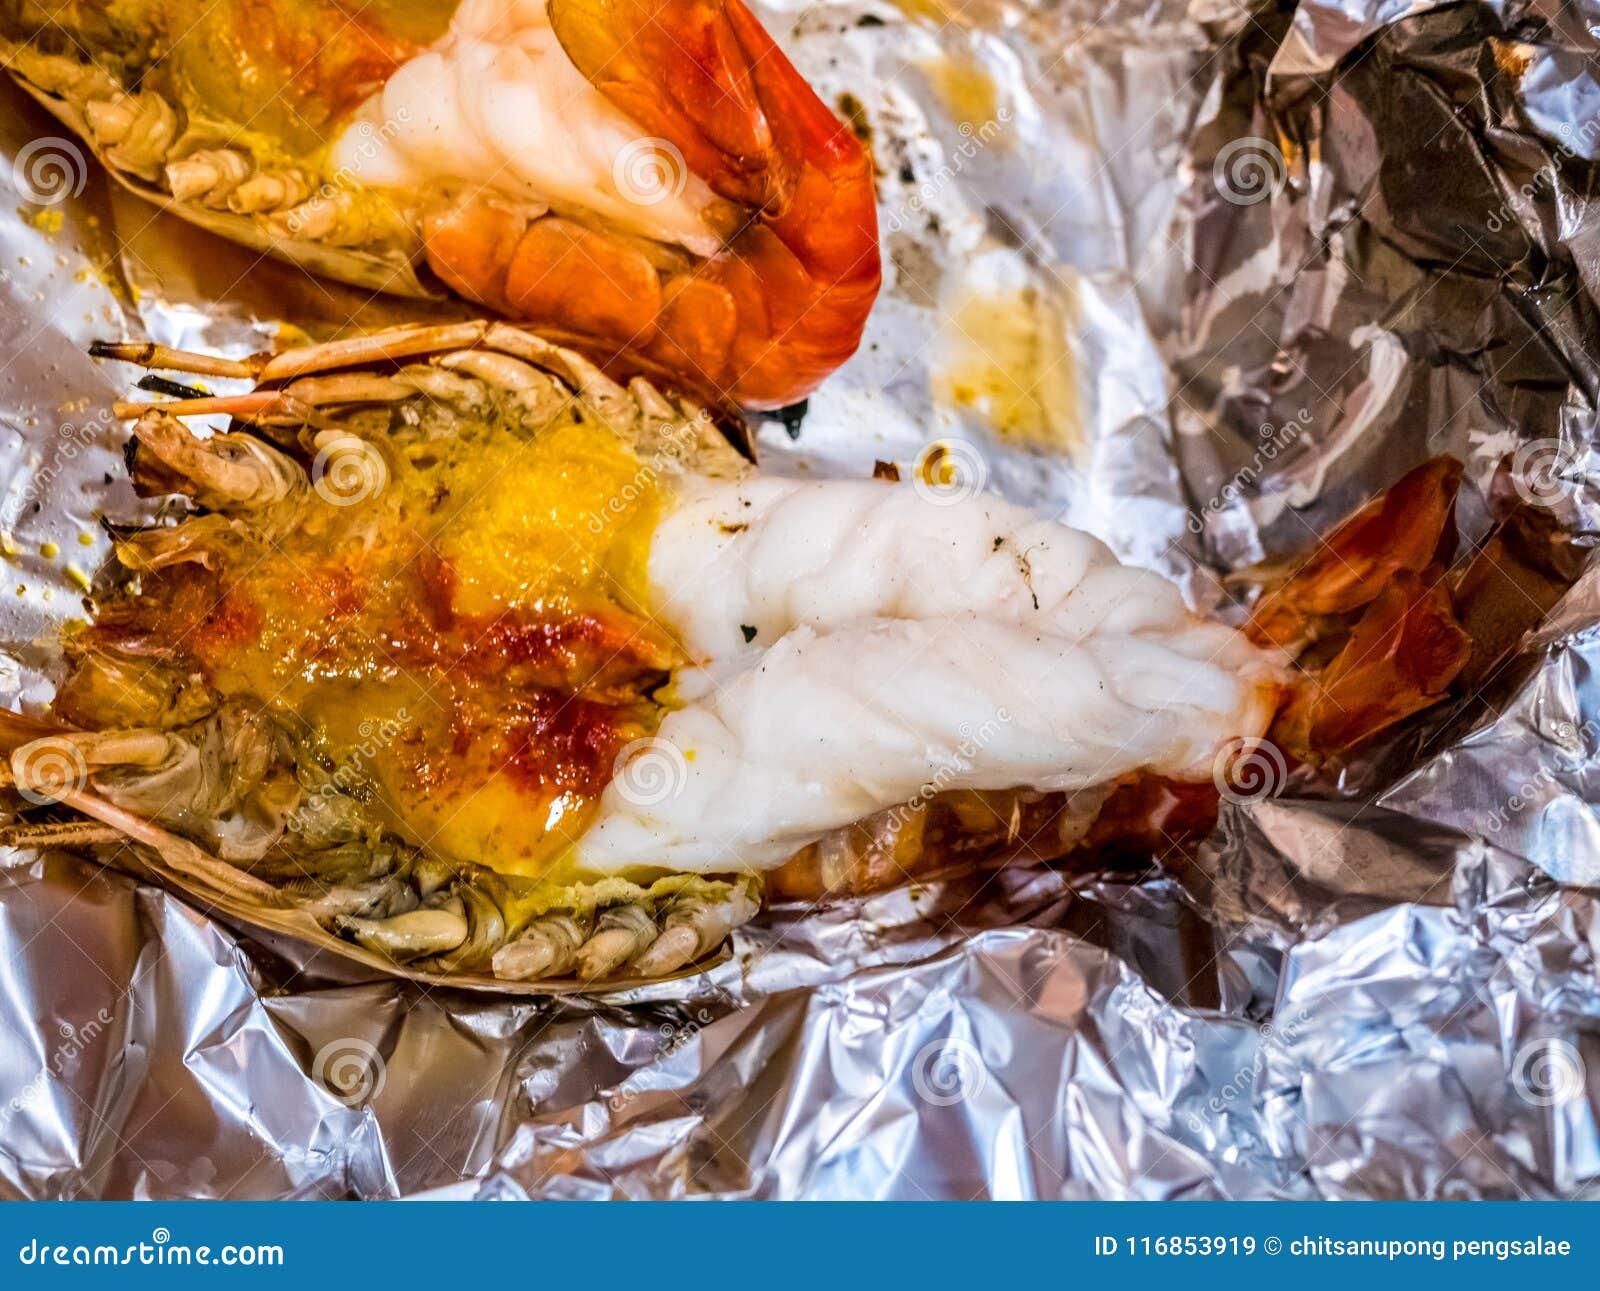 Grilled Giant River Prawn Or Big Shrimp On Aluminium Foil